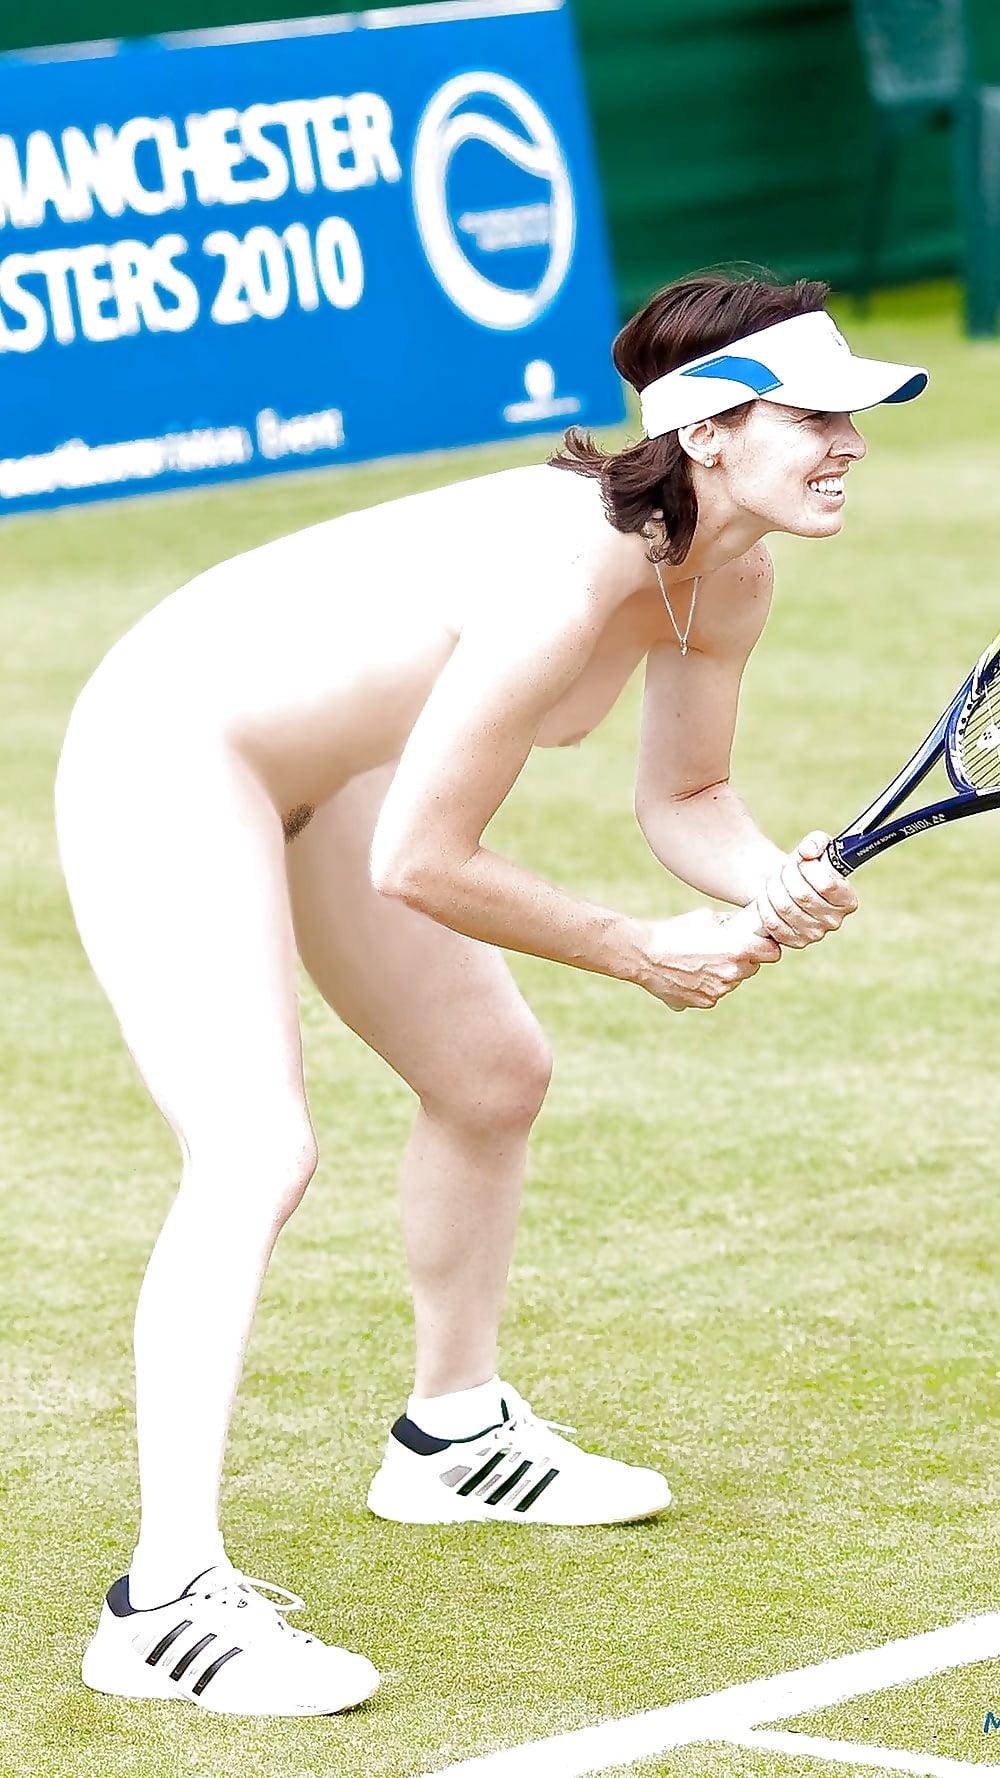 Martina Hingis Hot